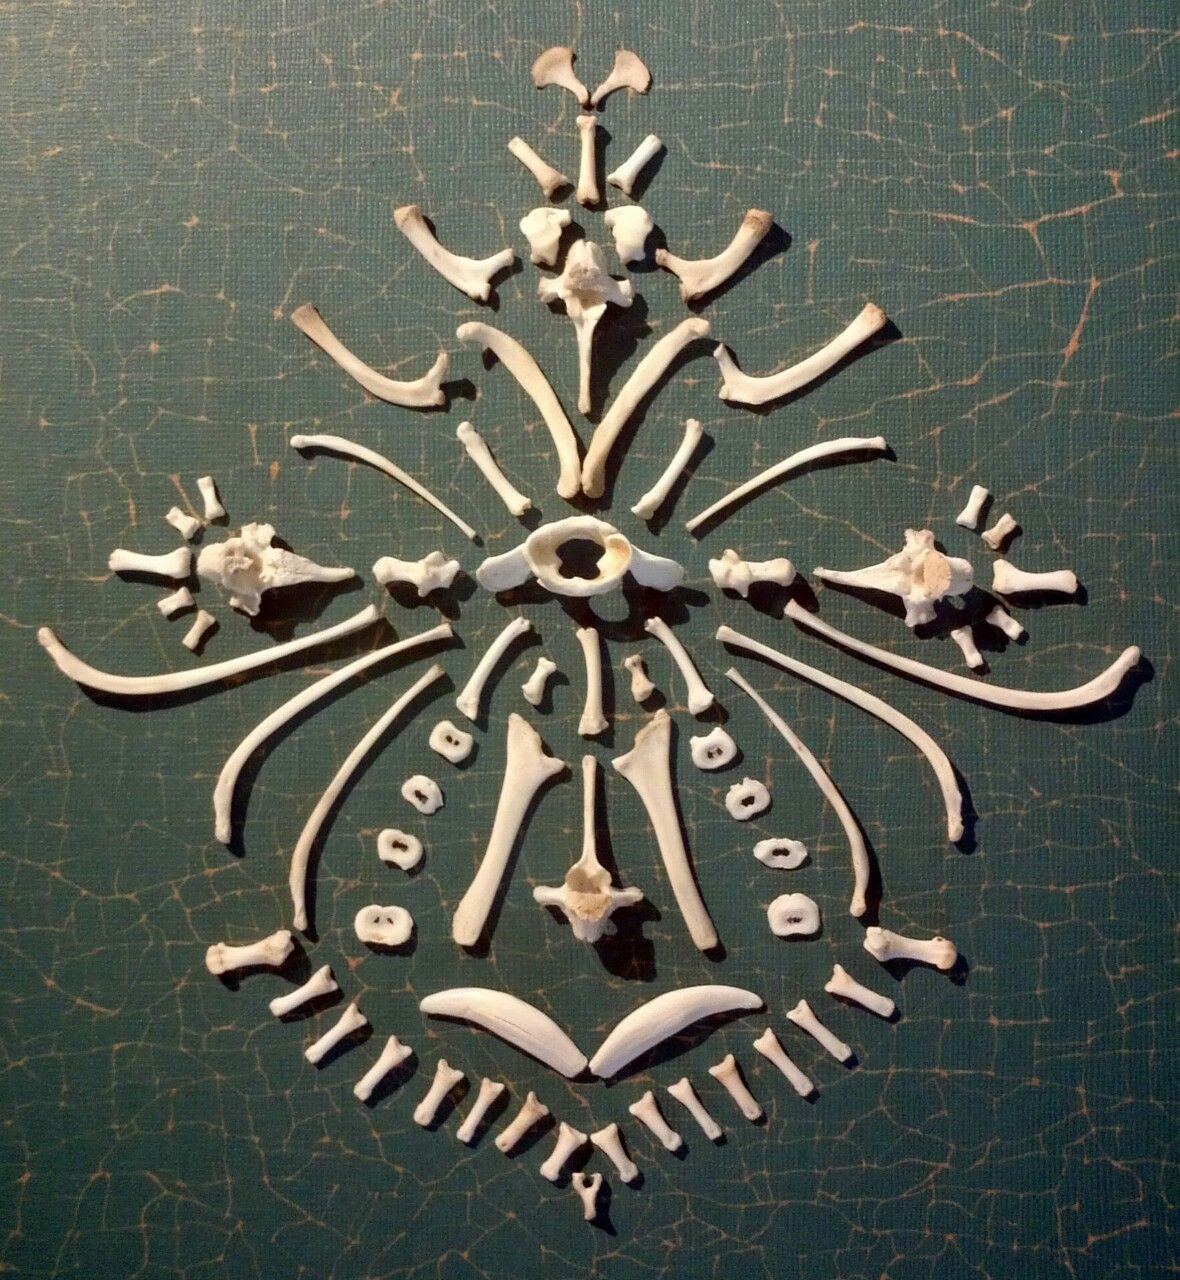 Autumn Edwards makes bone art!